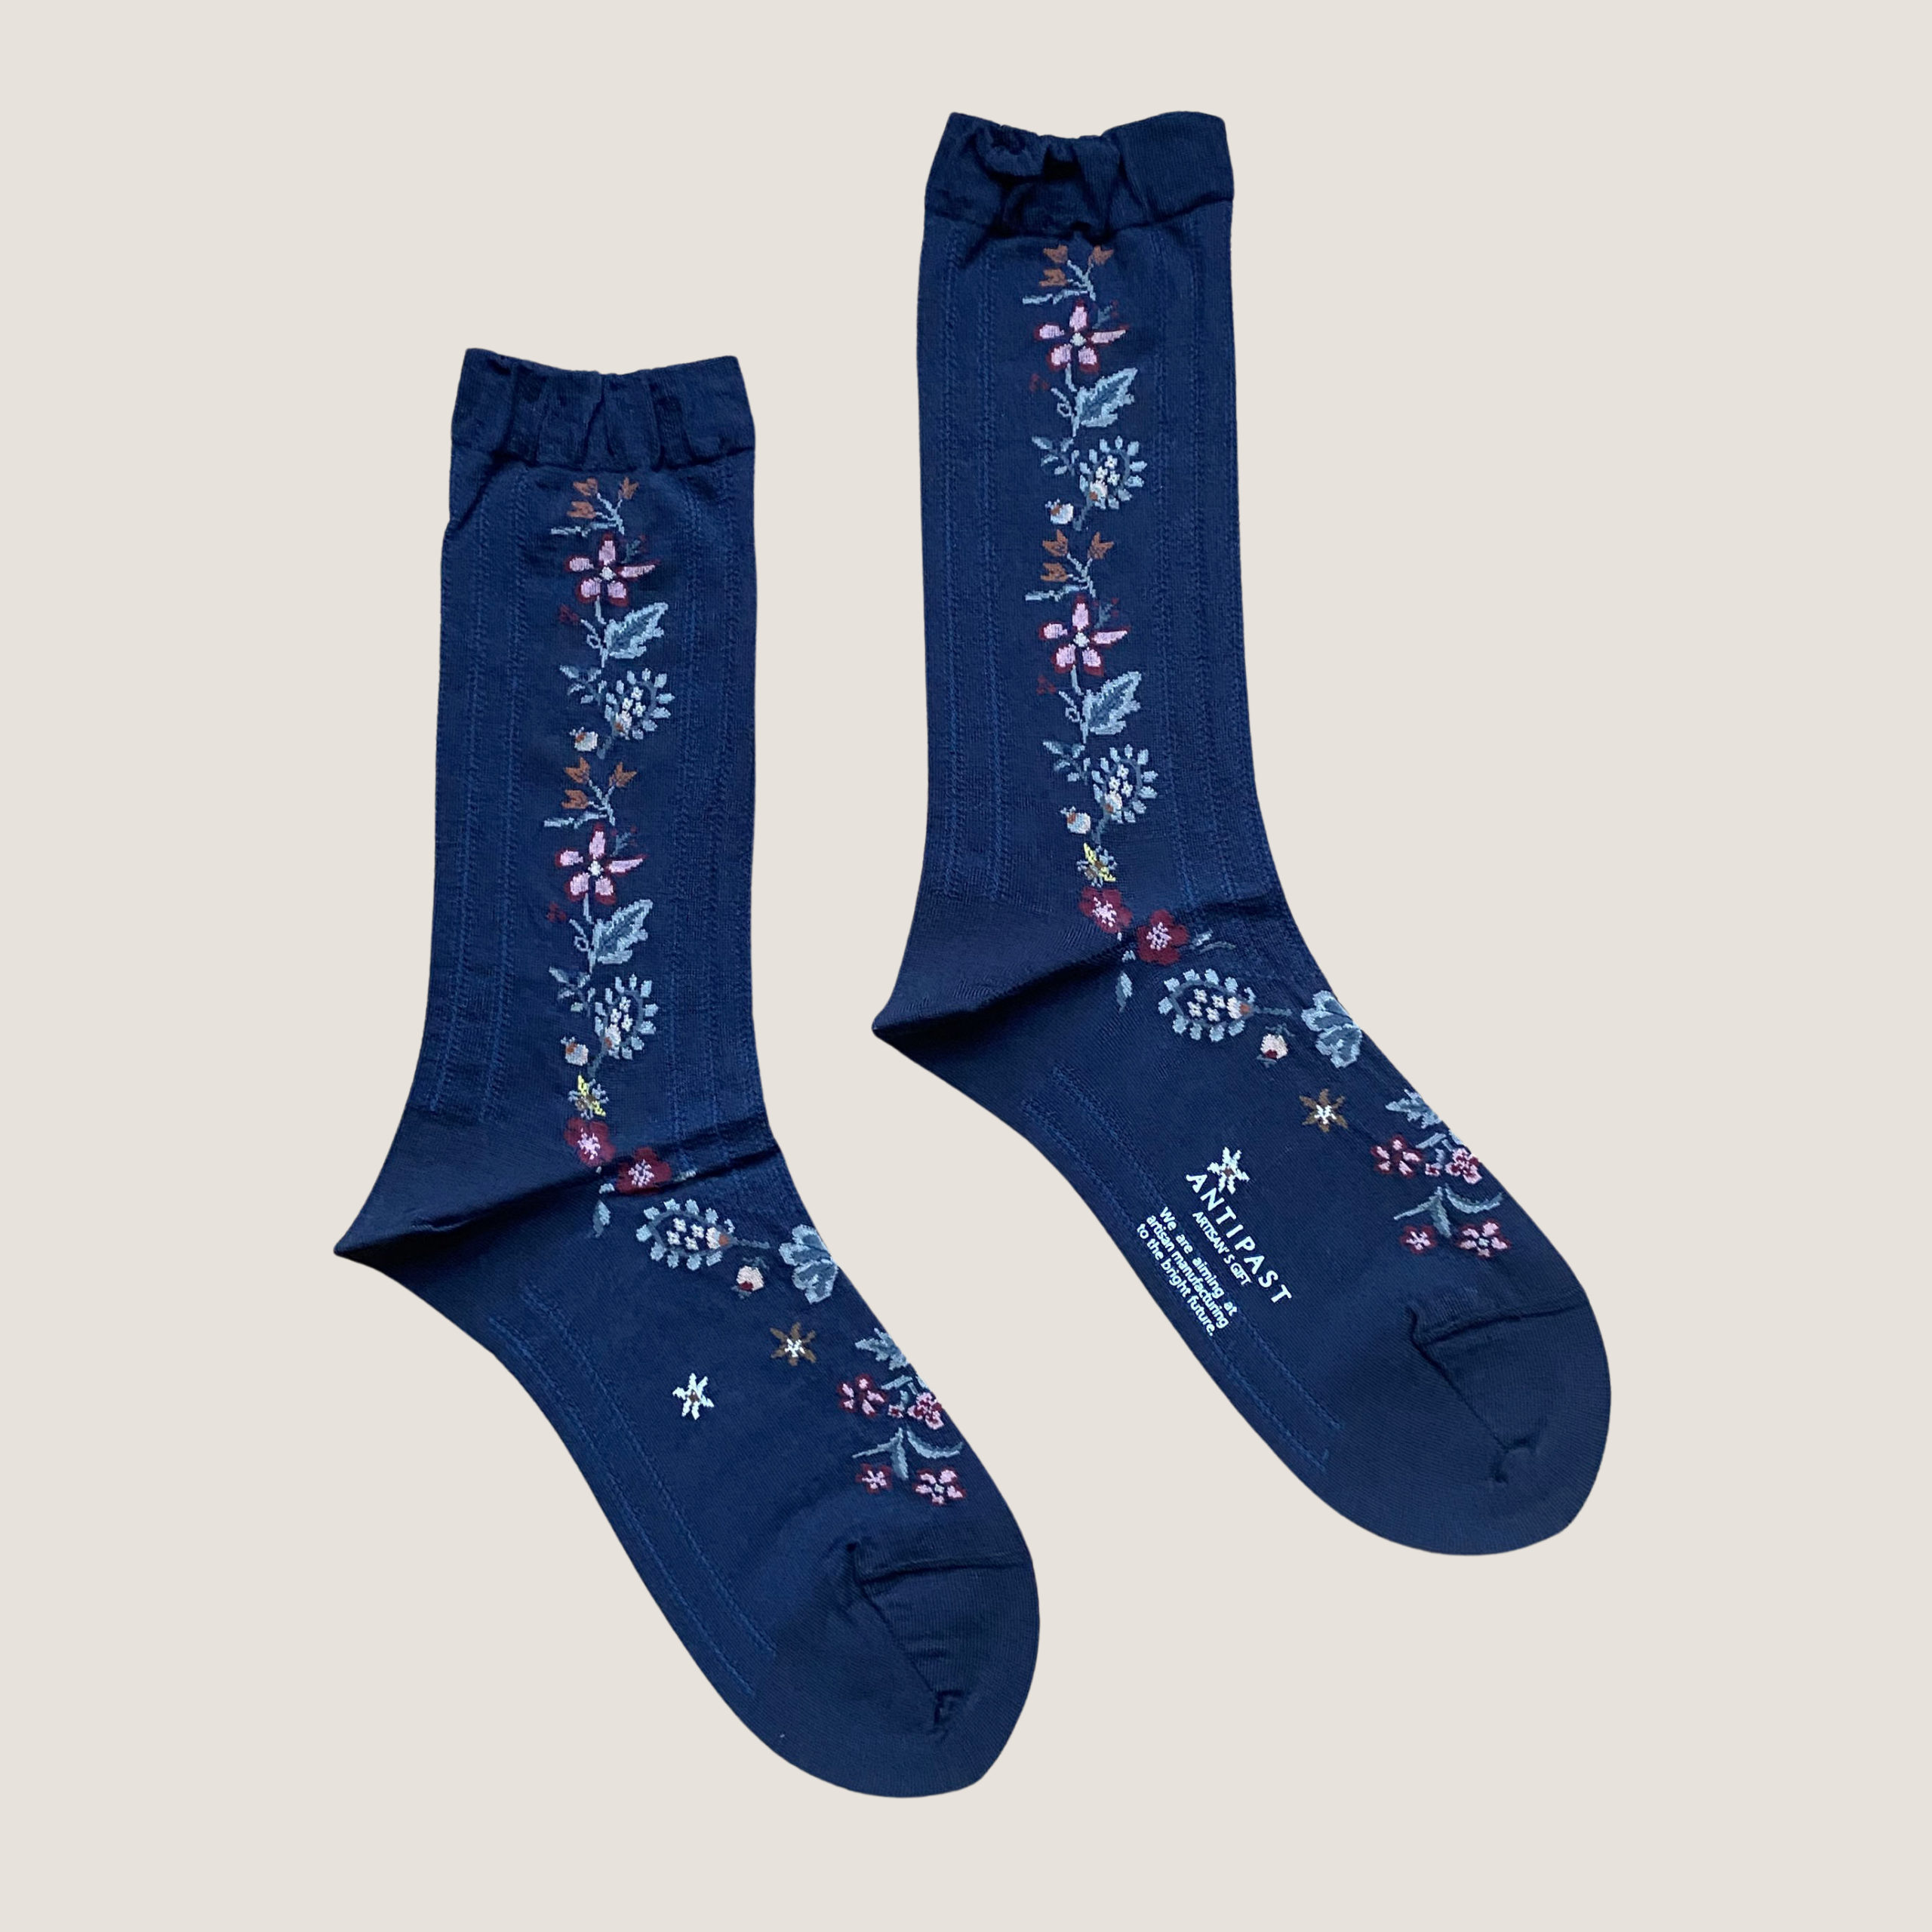 Socks - KT153S